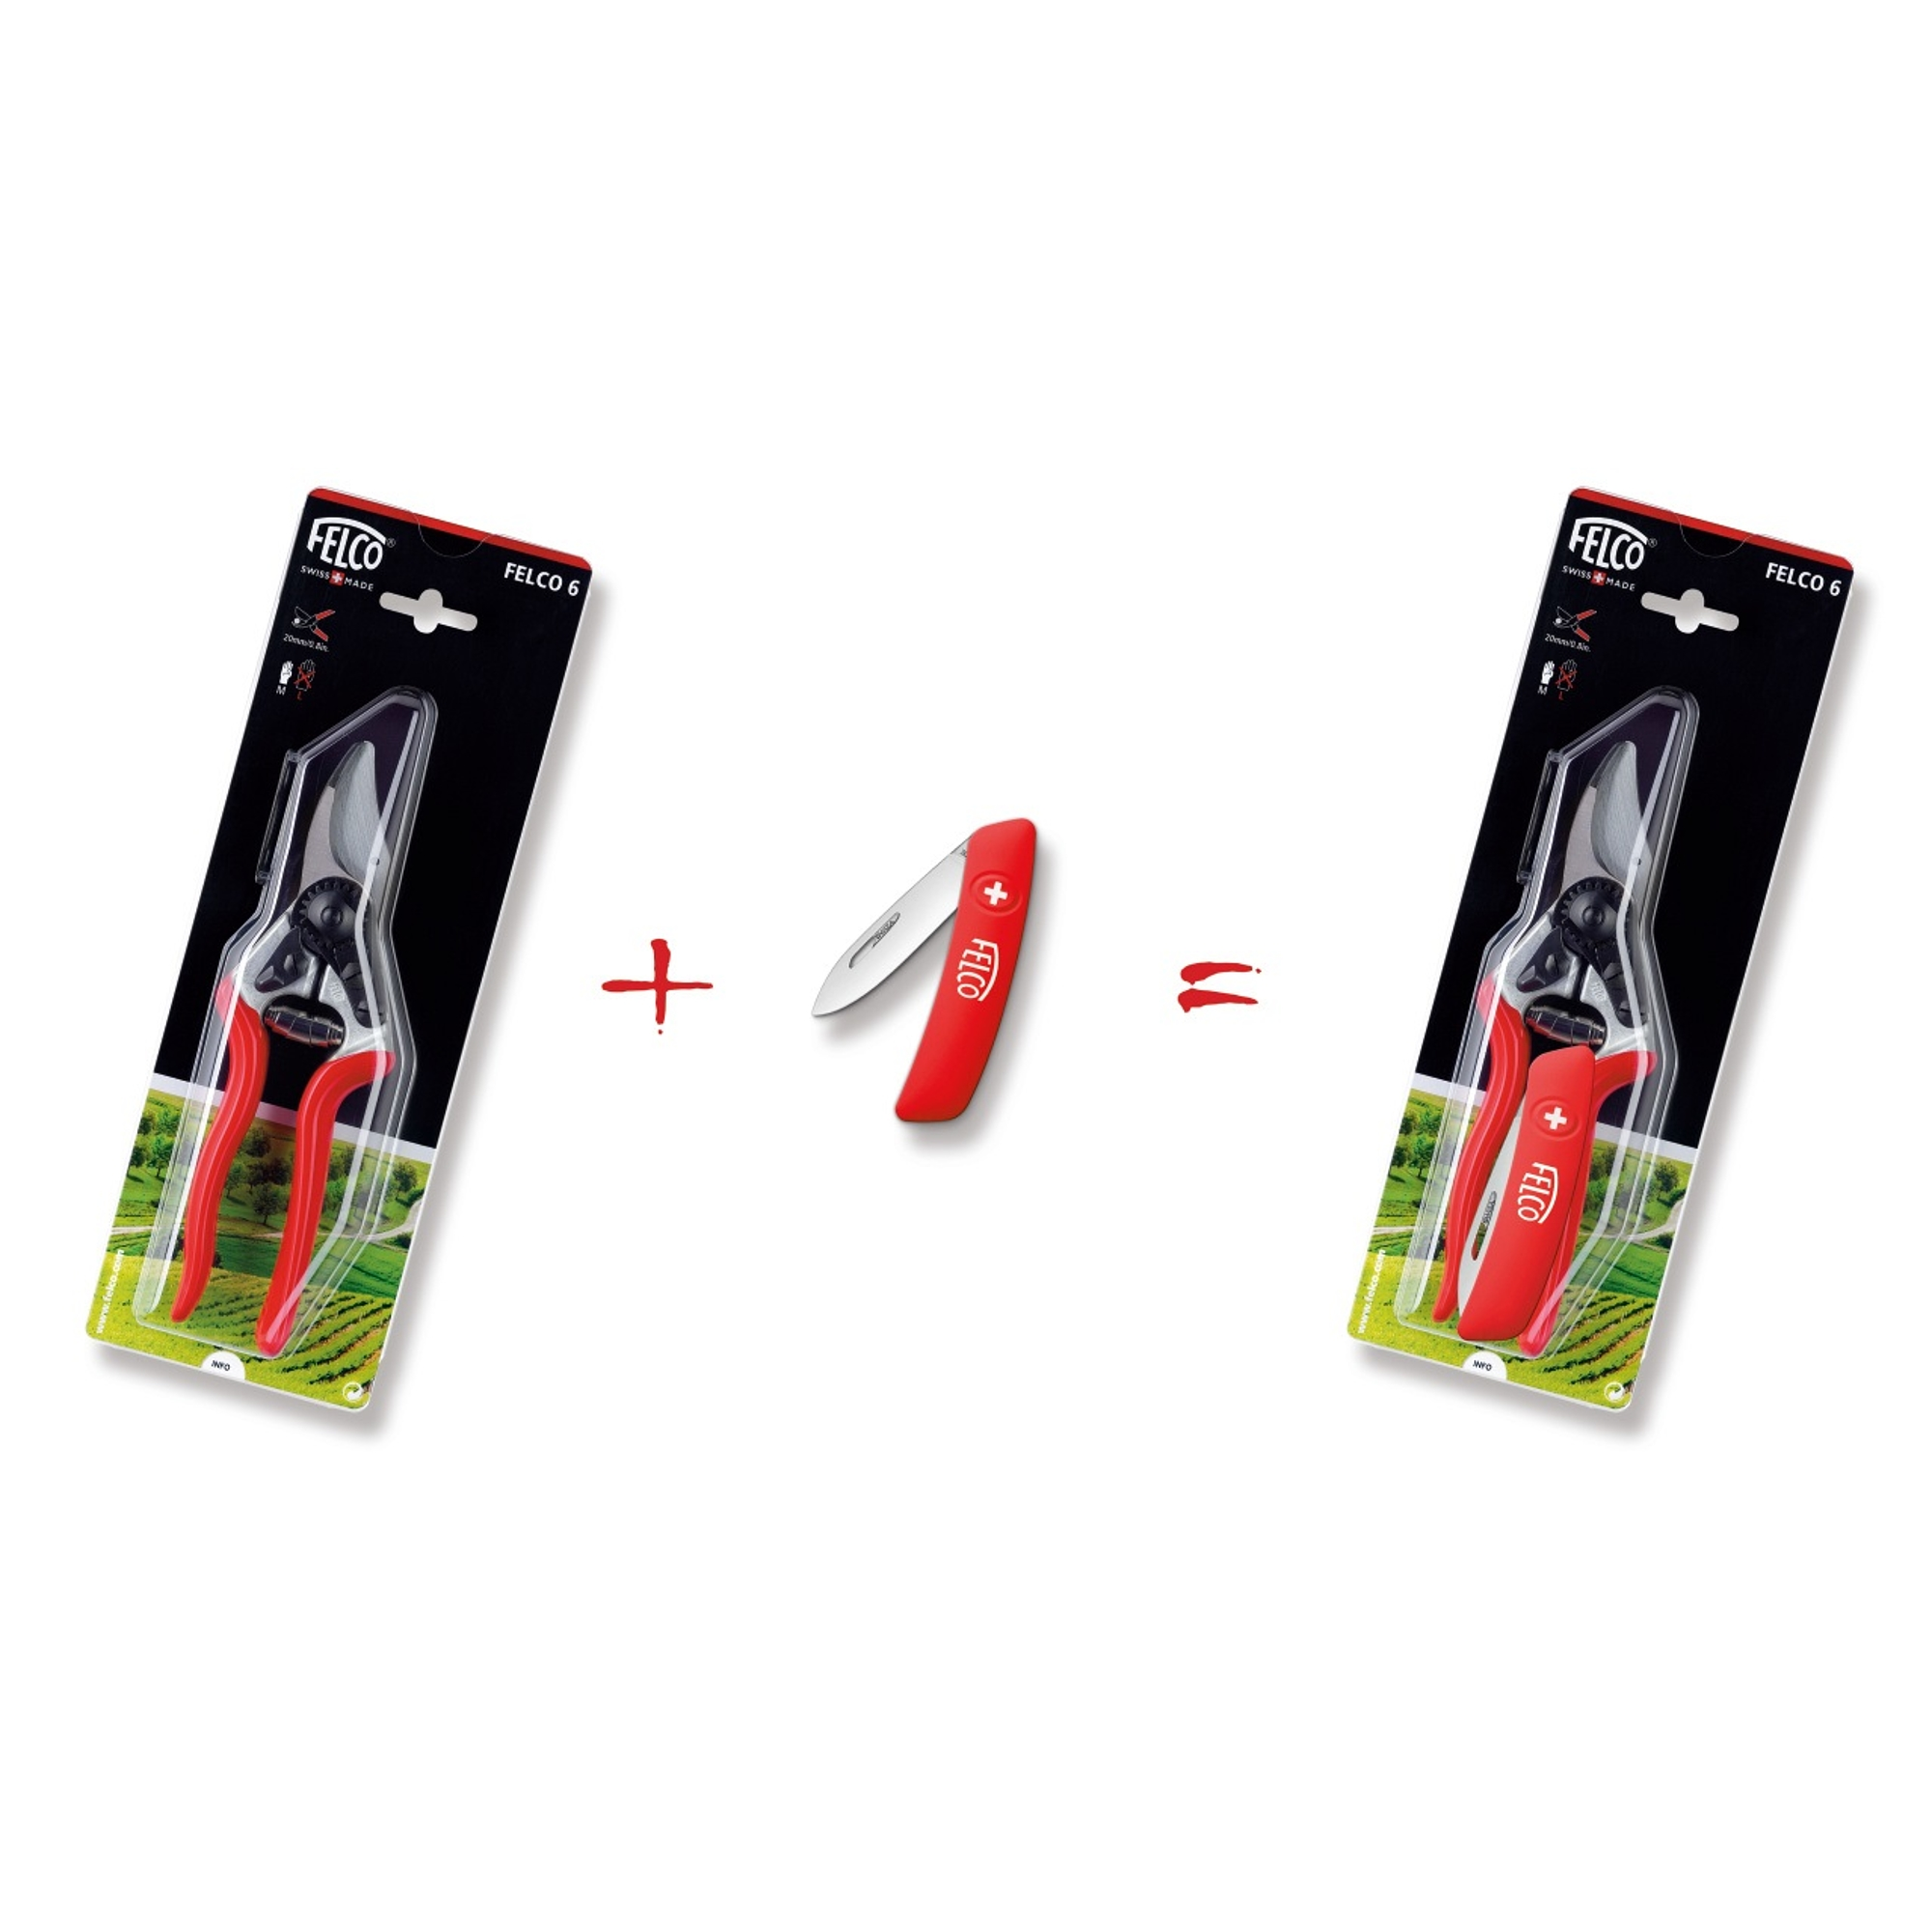 FELCO csomag P042 (Felco 6 + Felco 500 bicska)